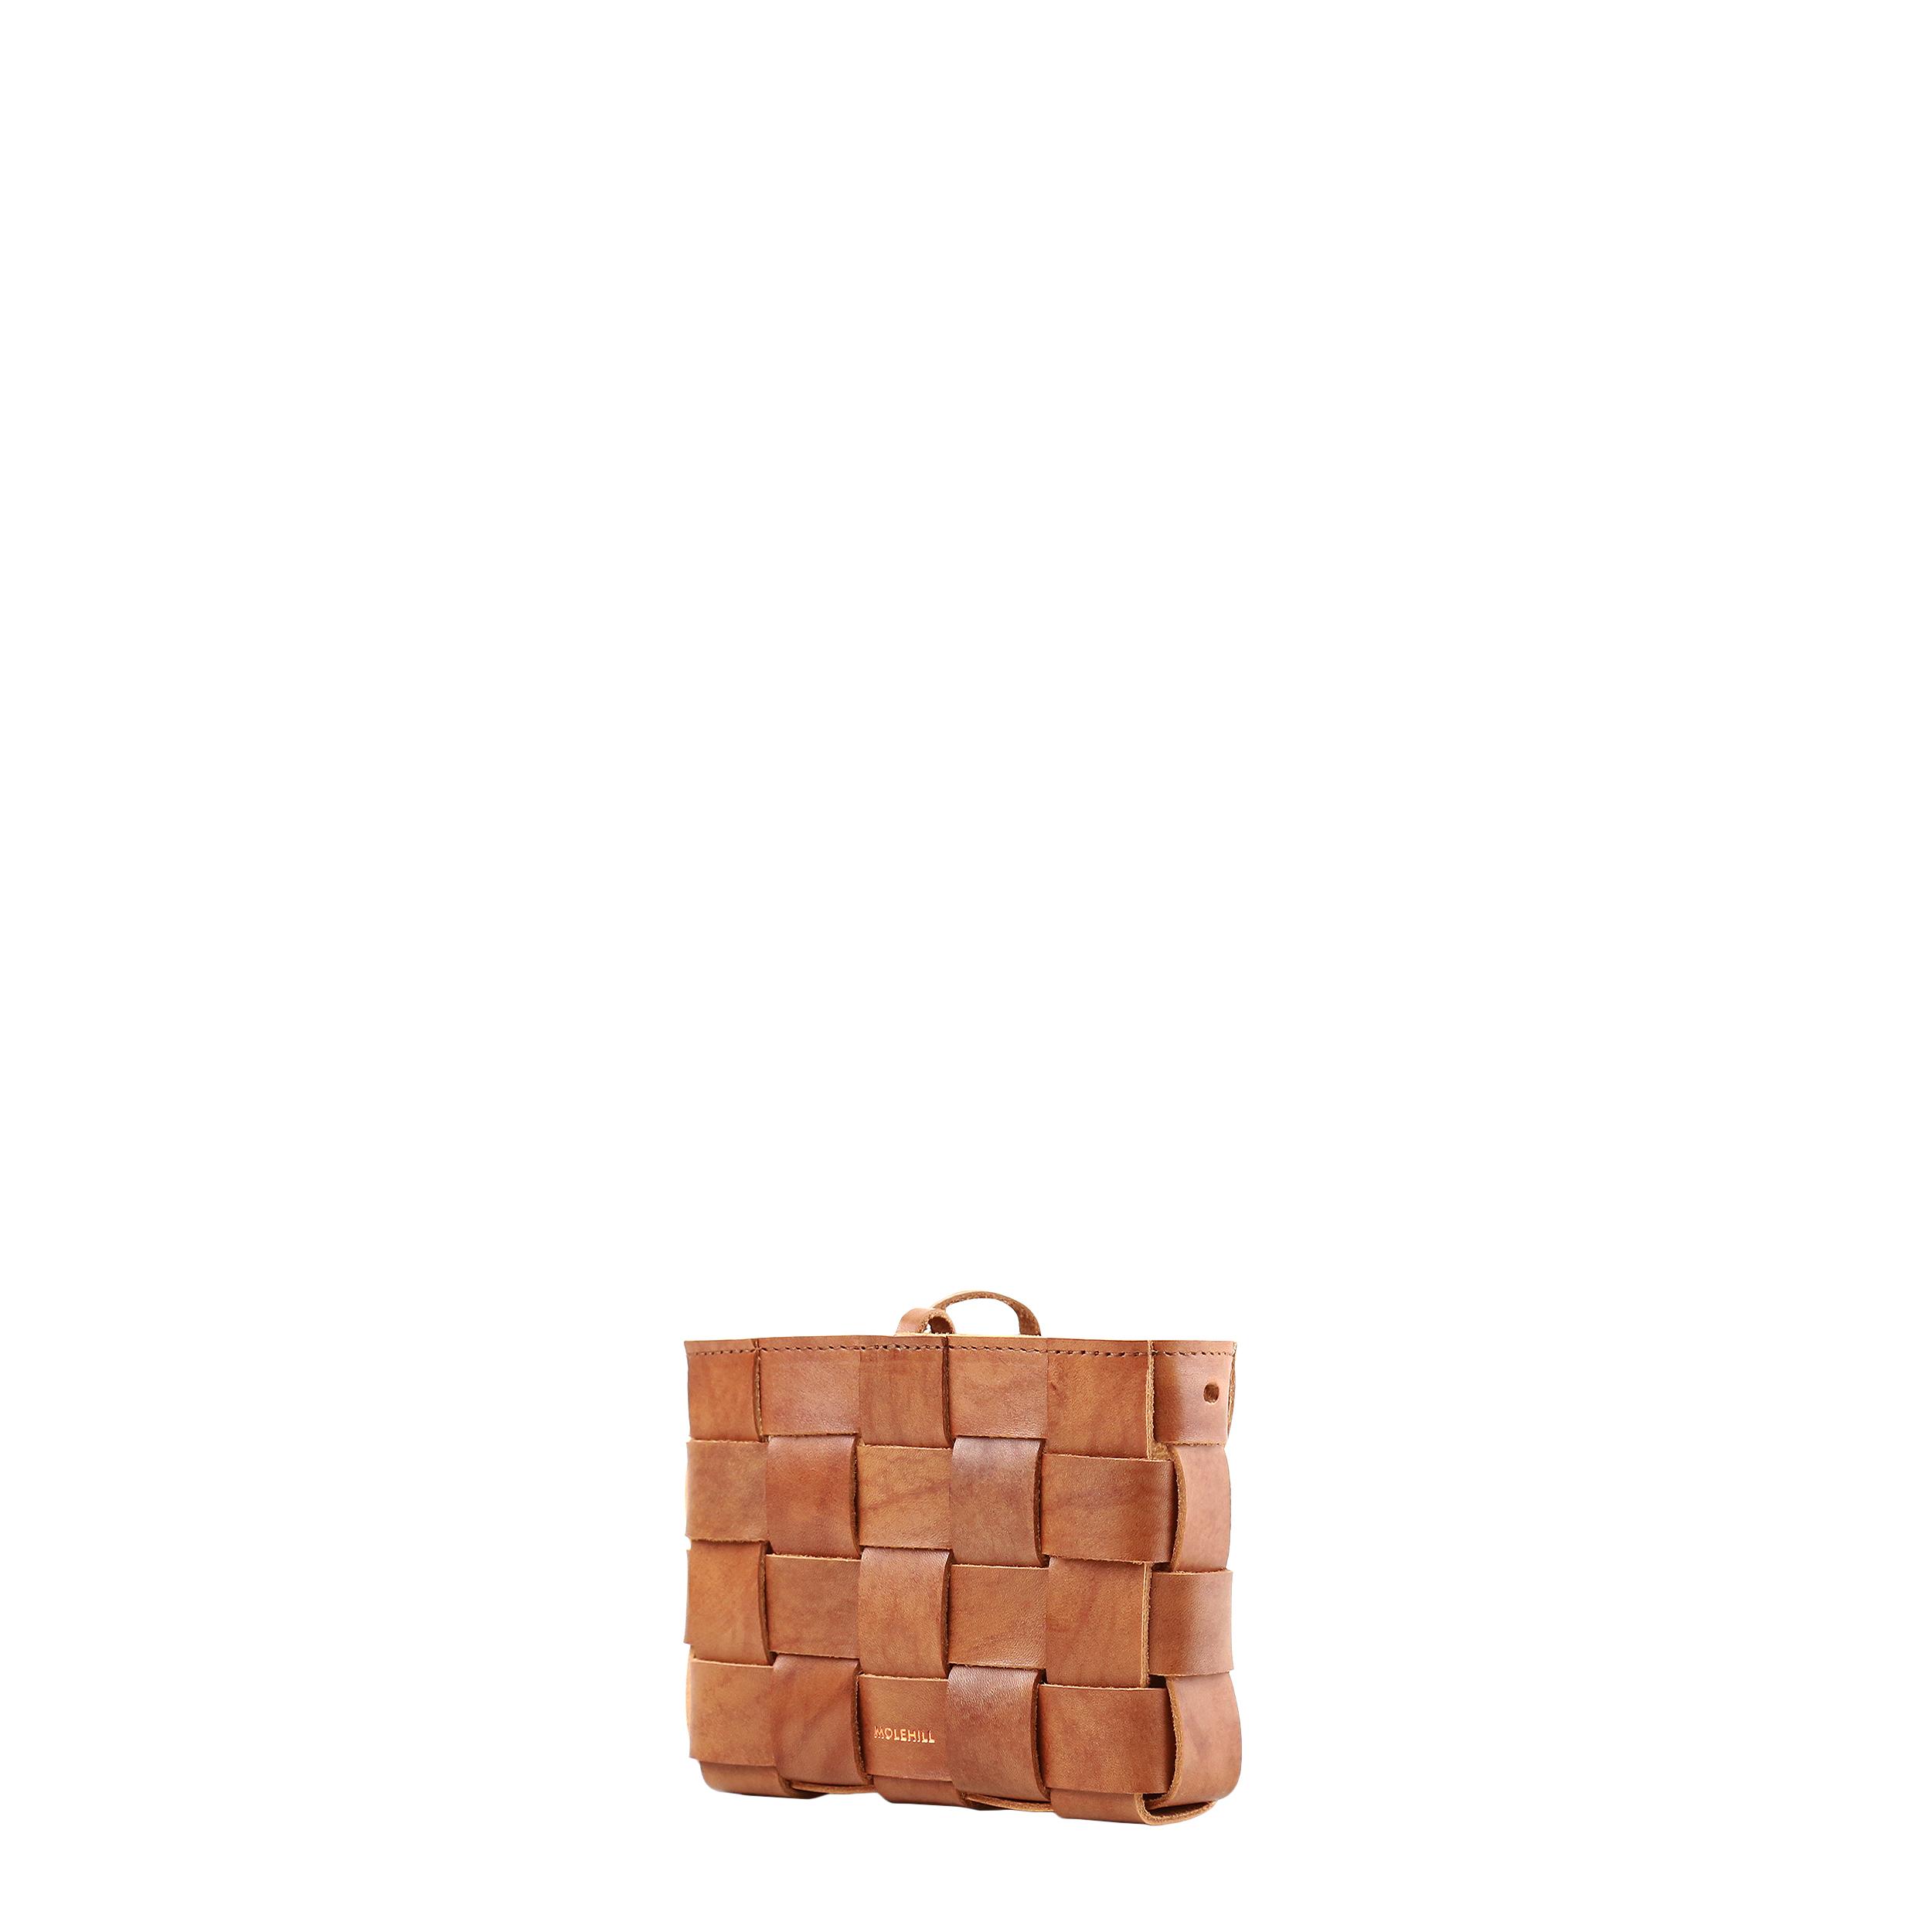 Pane Mini Crossbody Woven Bag Wild-4